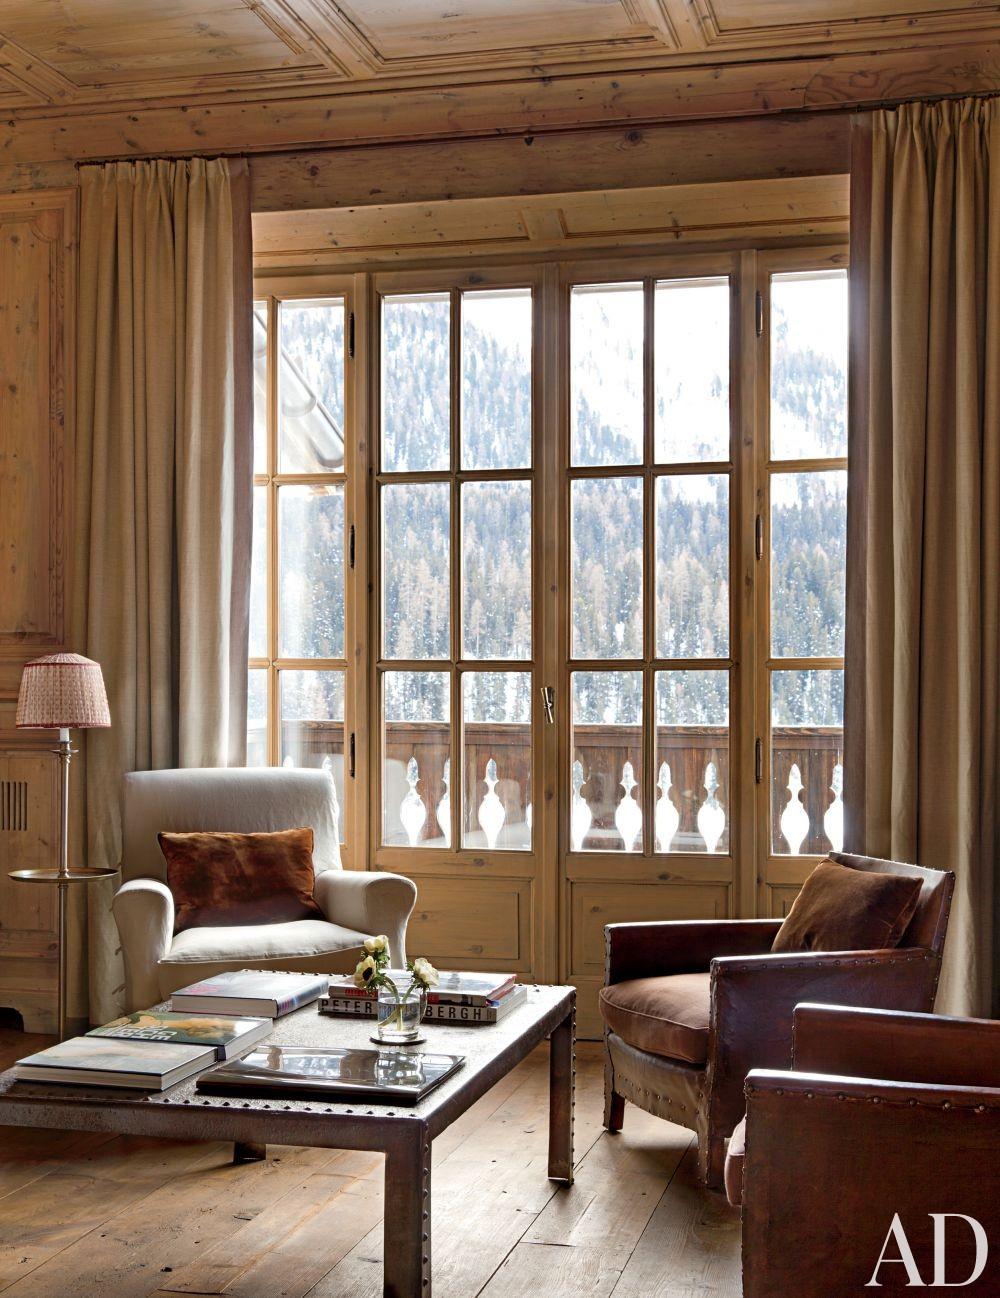 Rustic Media/Game Room by Studio Peregalli in Saint Moritz, Switzerland